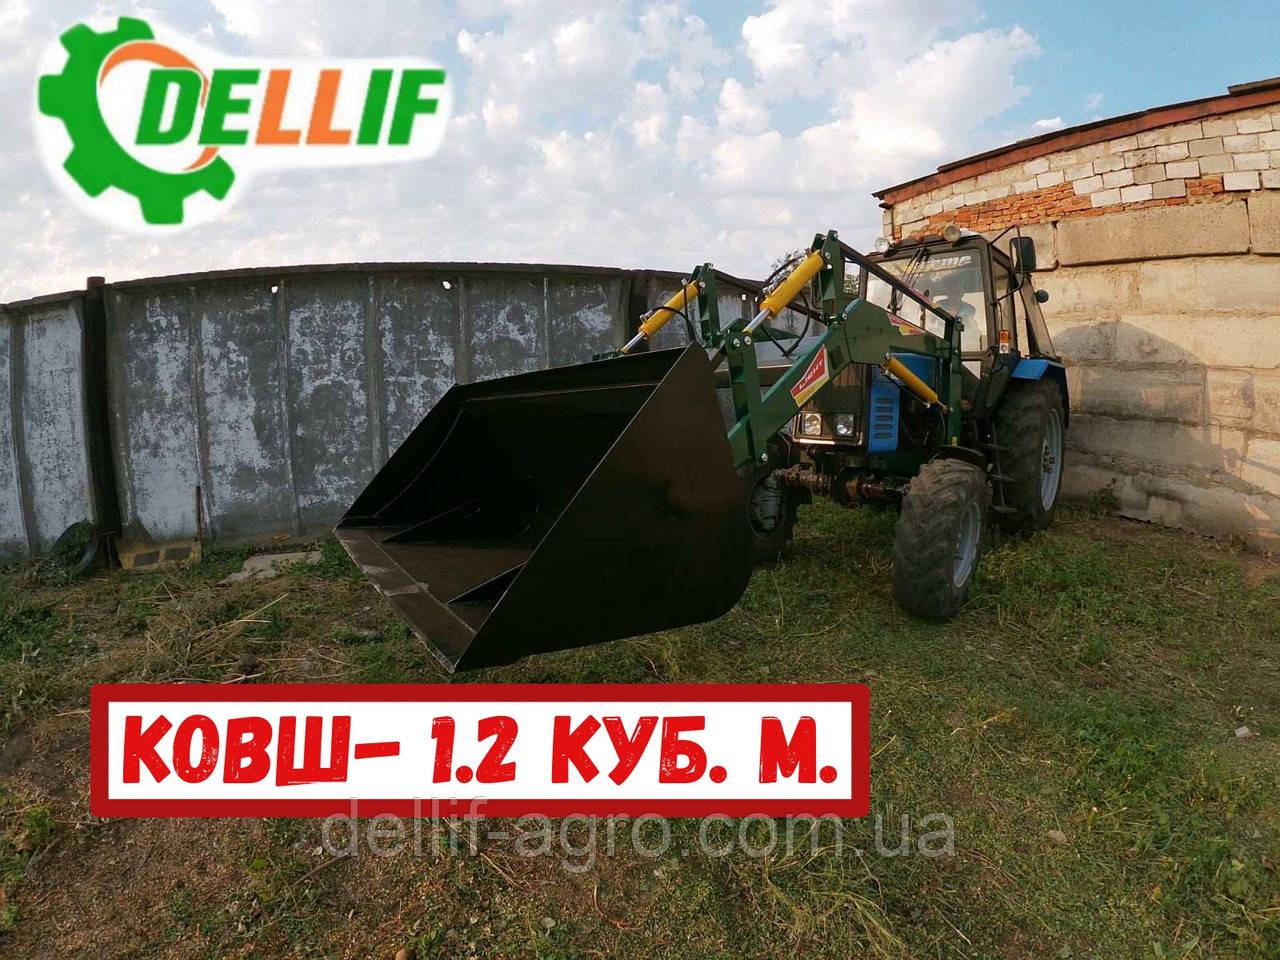 Кун на МТЗ -  Dellif Light 1200 с ковшом объёмом 1.2 м3